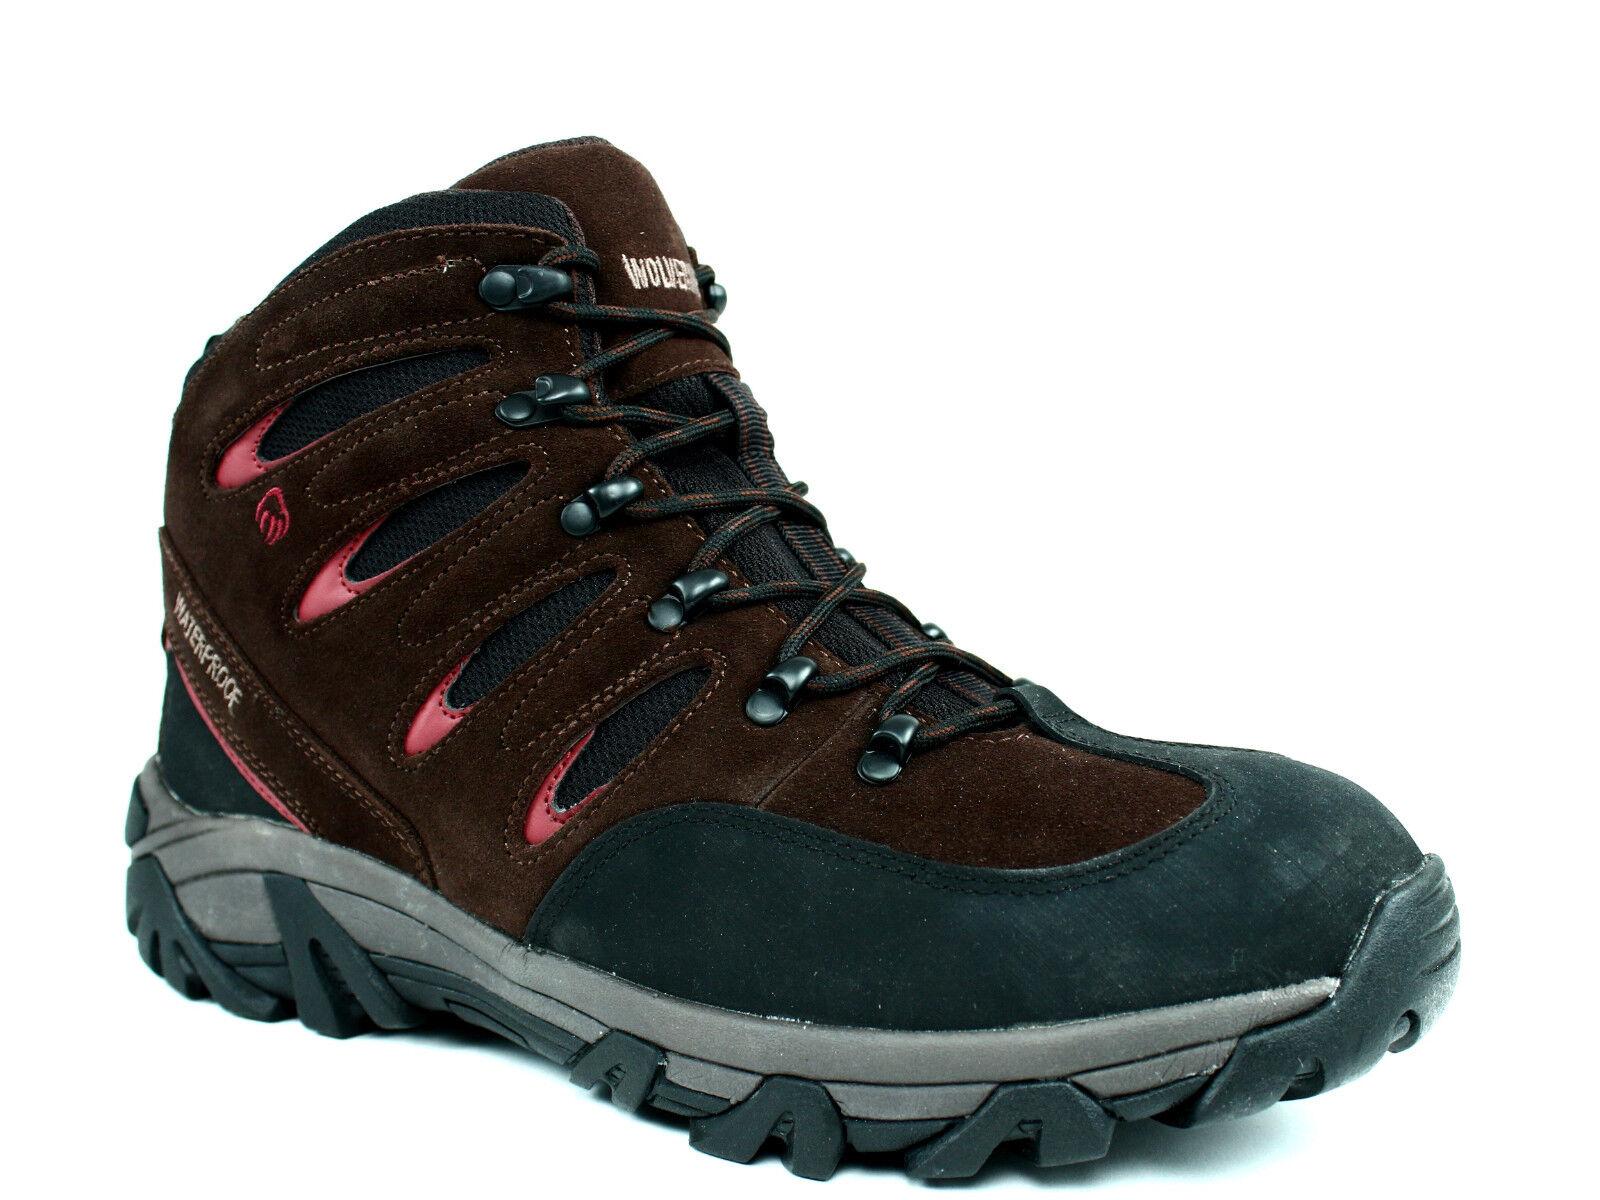 Wolverine HUCK Mid  Water Proof  Slip Resistant  Mens Casual  Work Hiking  Boot